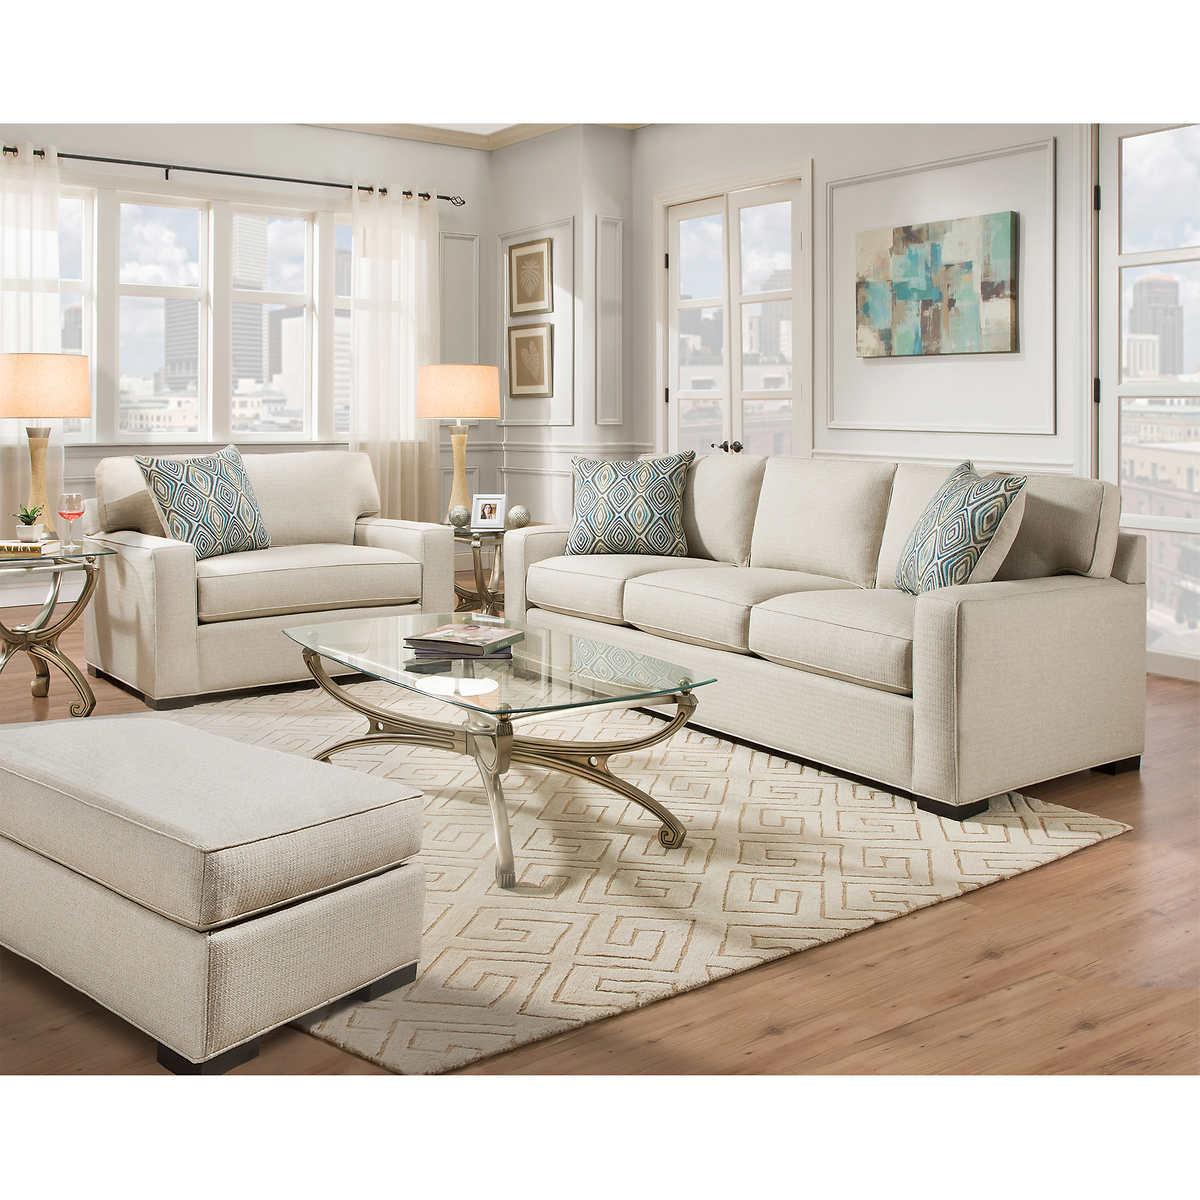 Pulaski Furniture Fabric Sofas Sectionals Costco